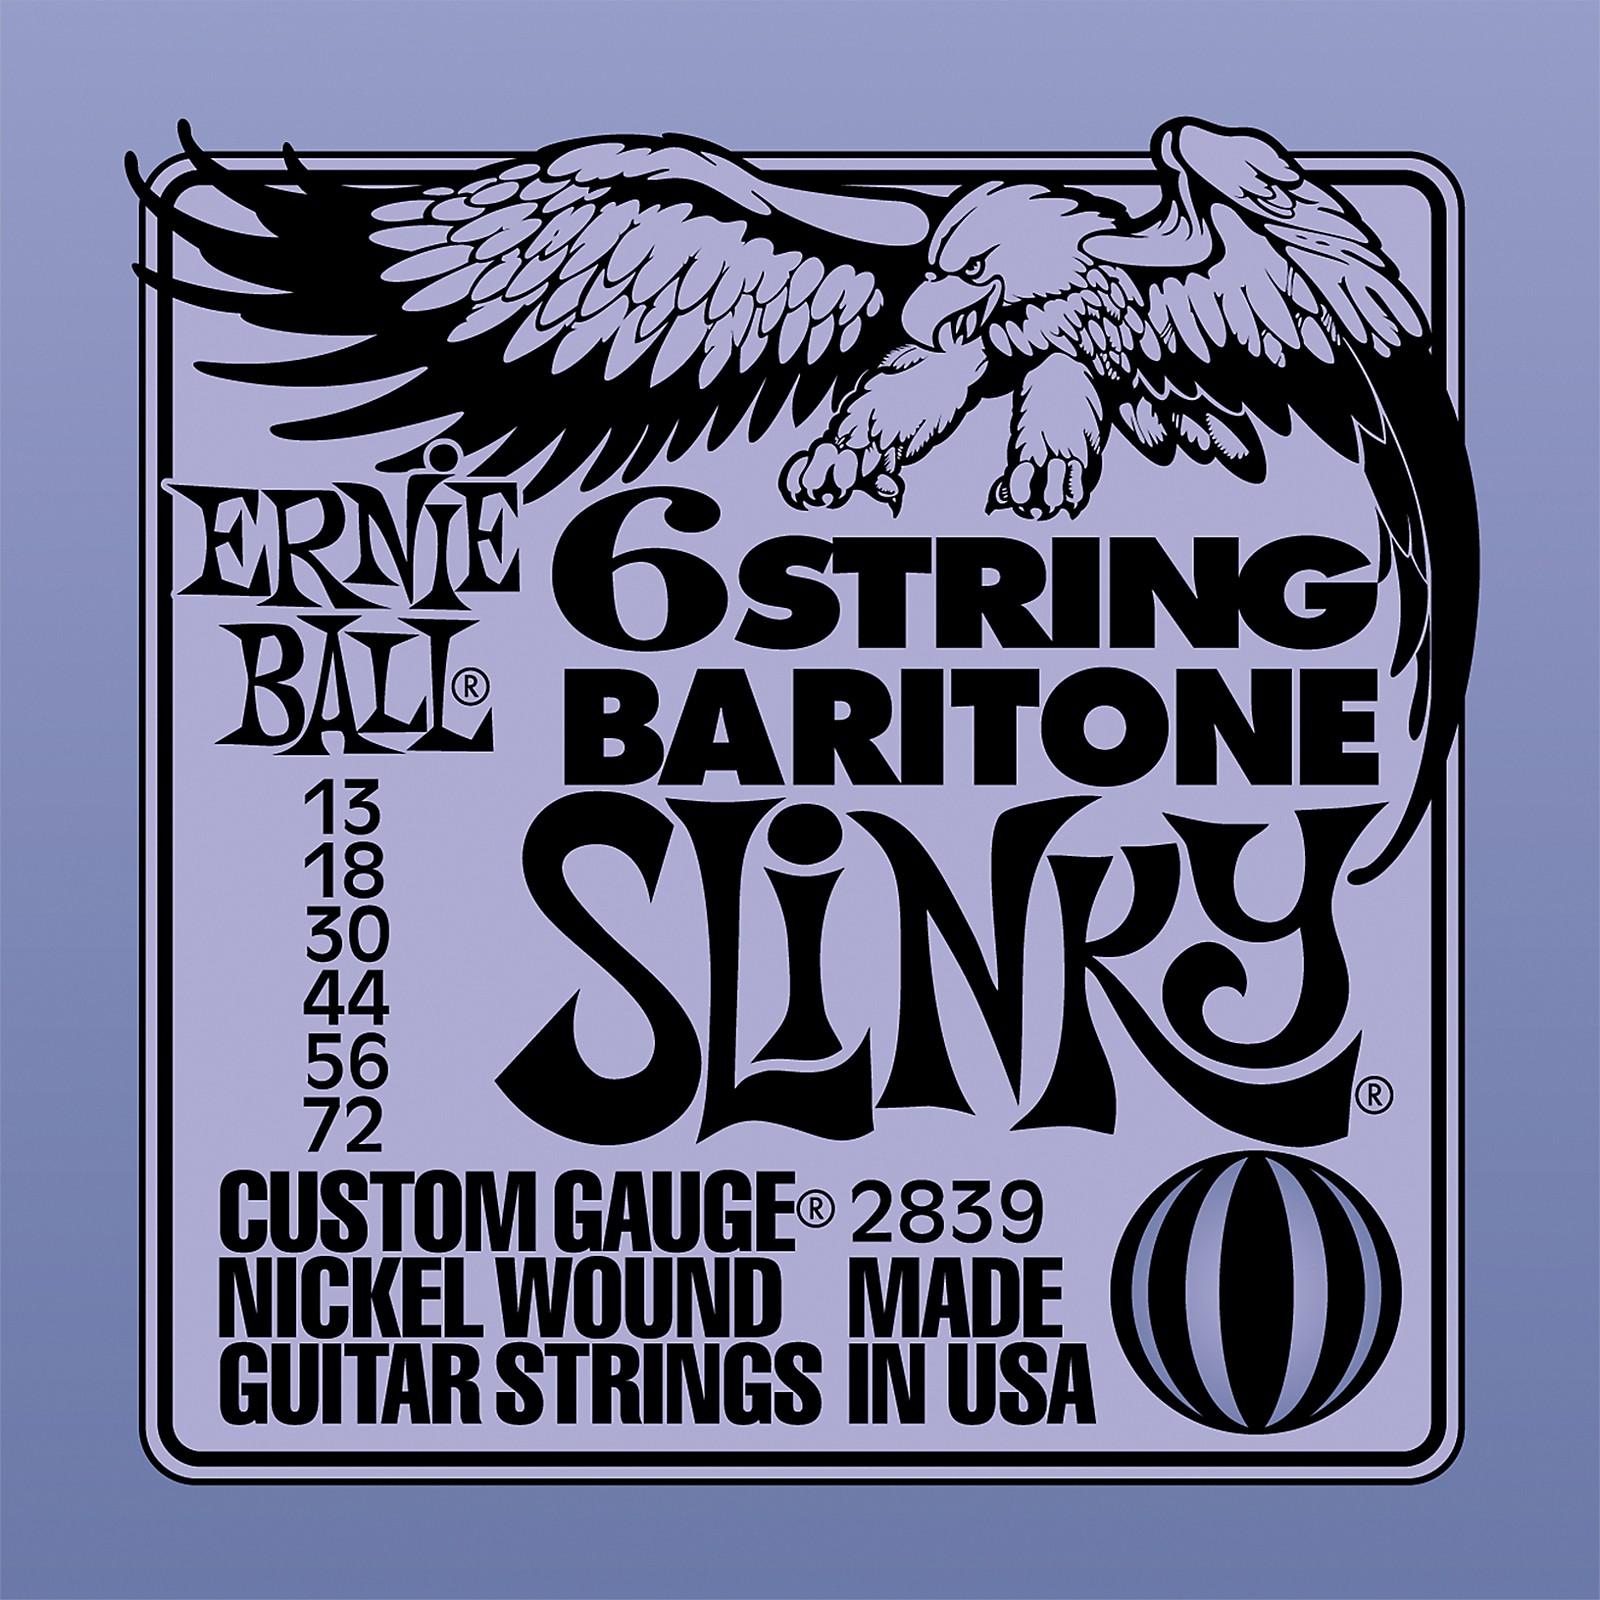 Ernie Ball 2839 Baritone Electric Guitar String Set